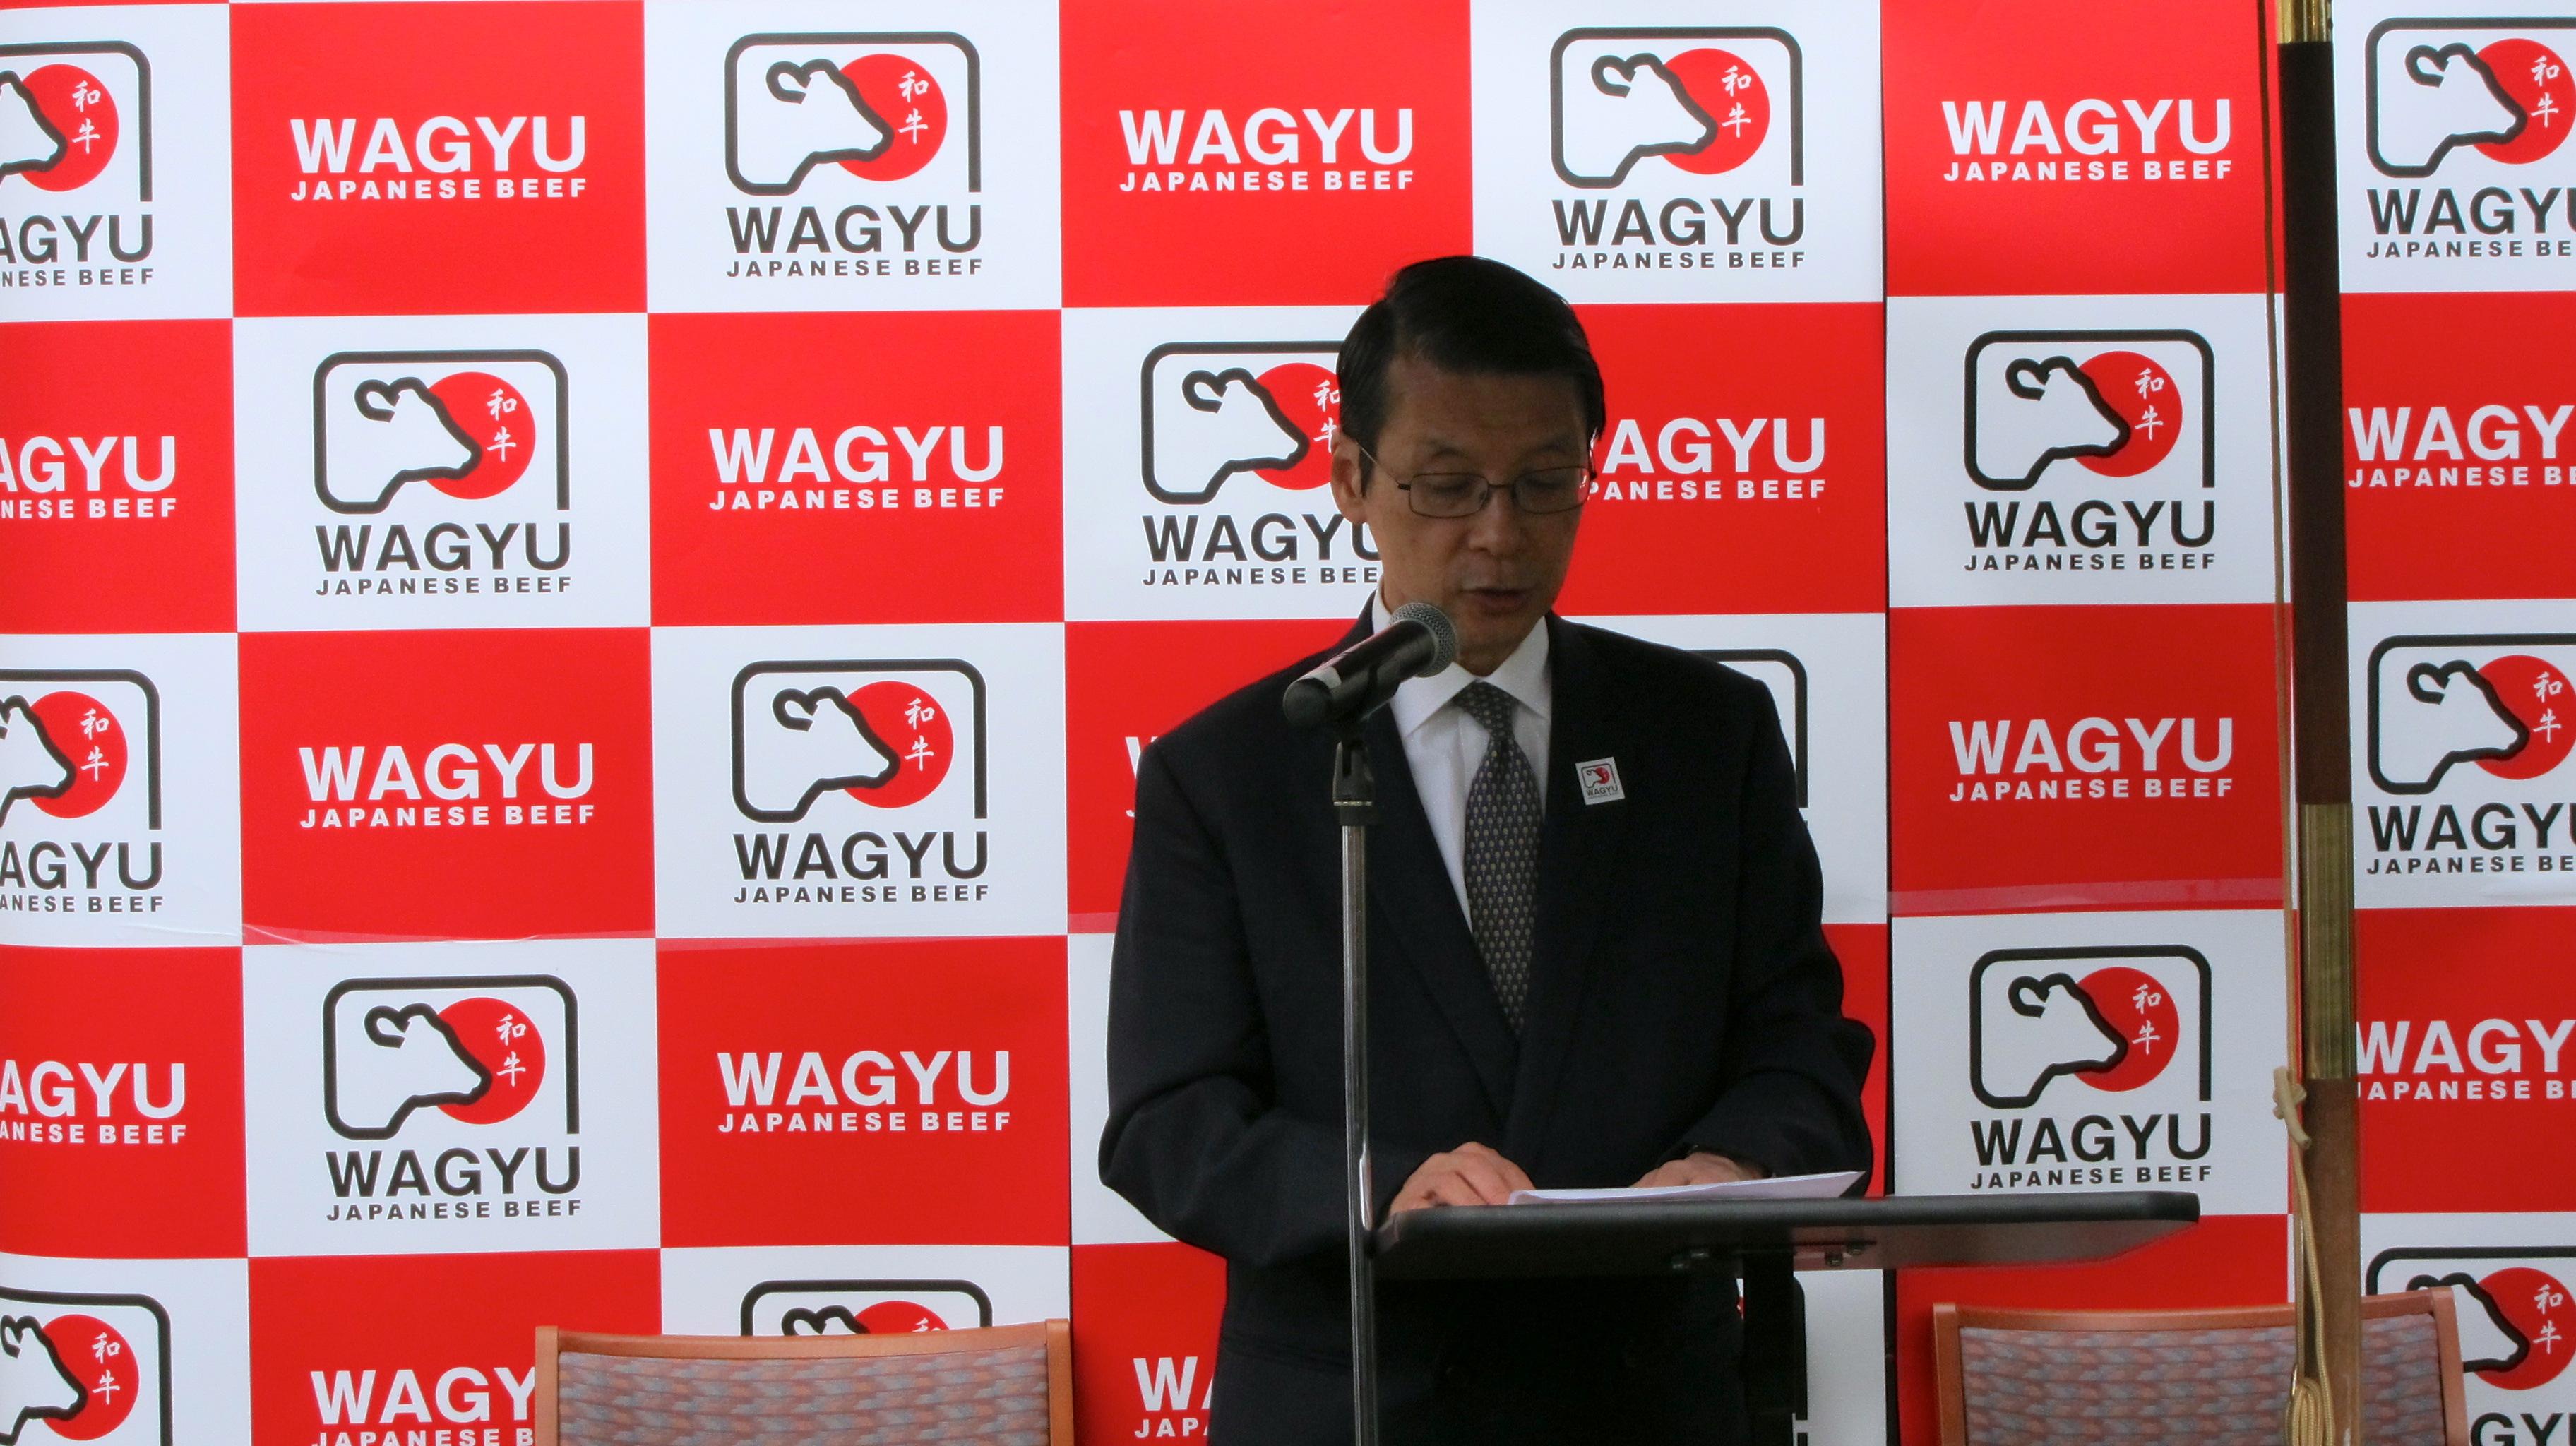 Keiichi Hayashi is Japan's ambassador to the UK